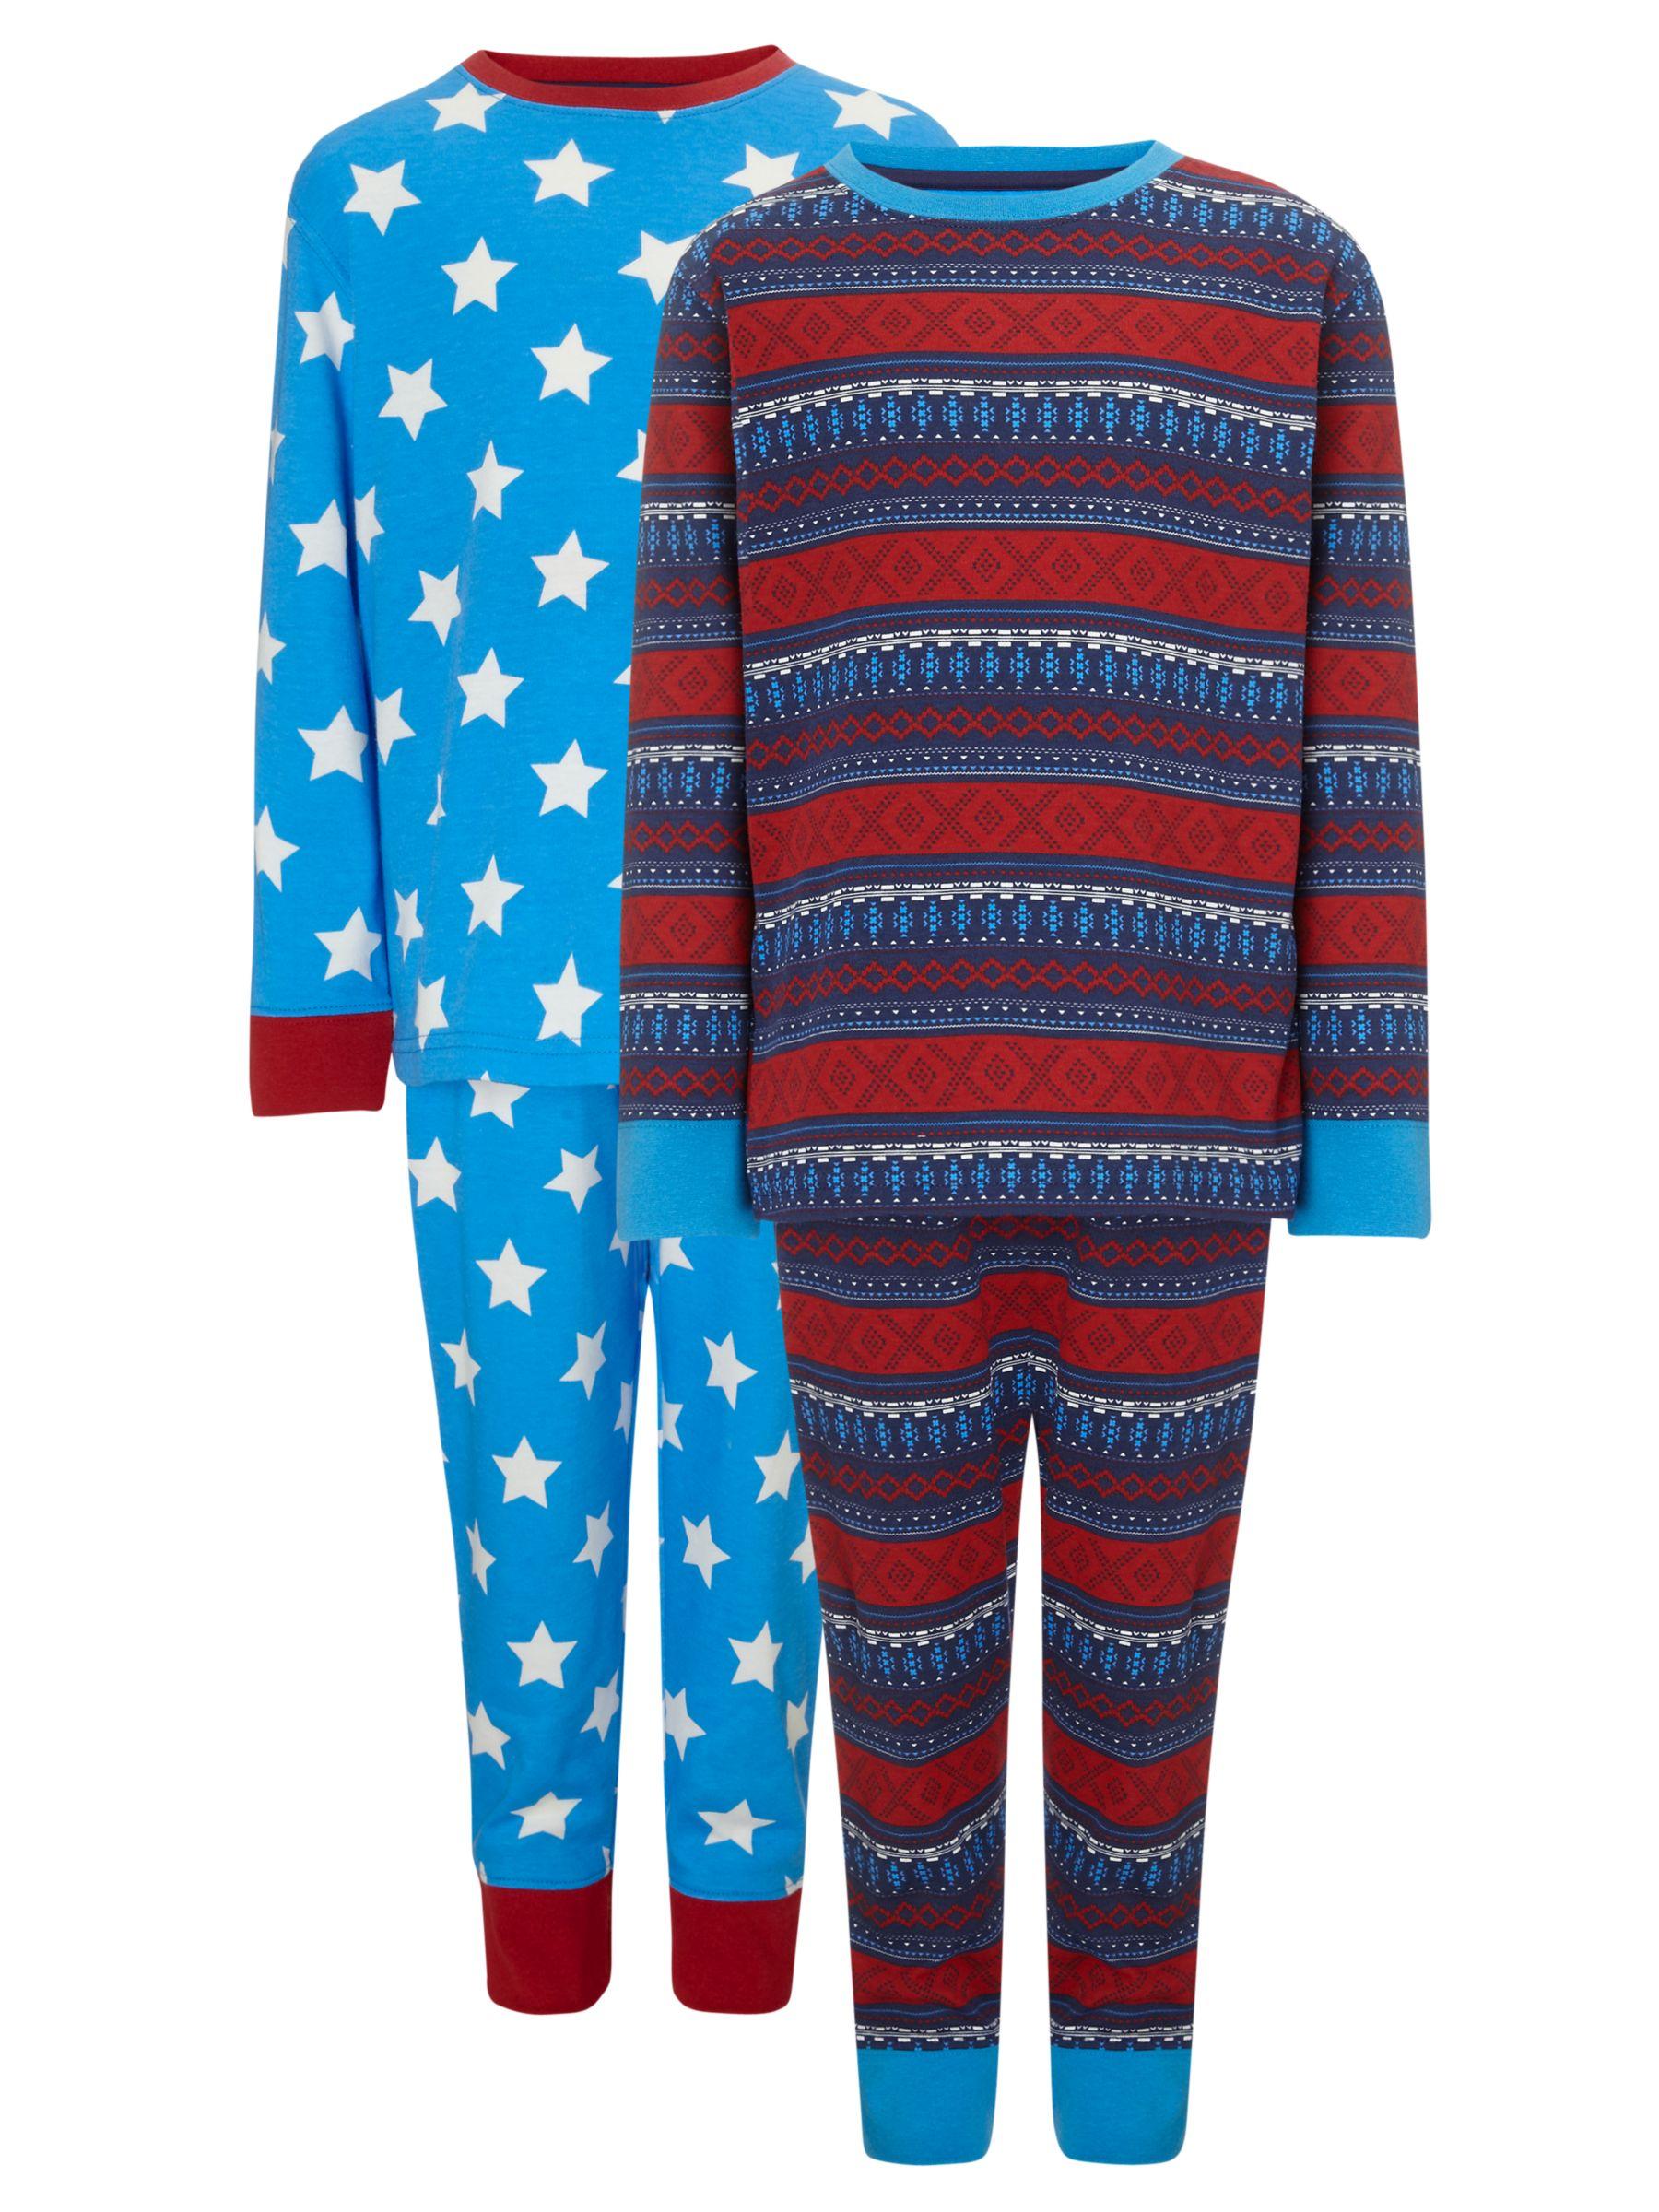 John Lewis Boy Fair Isle and Star Pyjamas, Pack of 2, Red/Blue